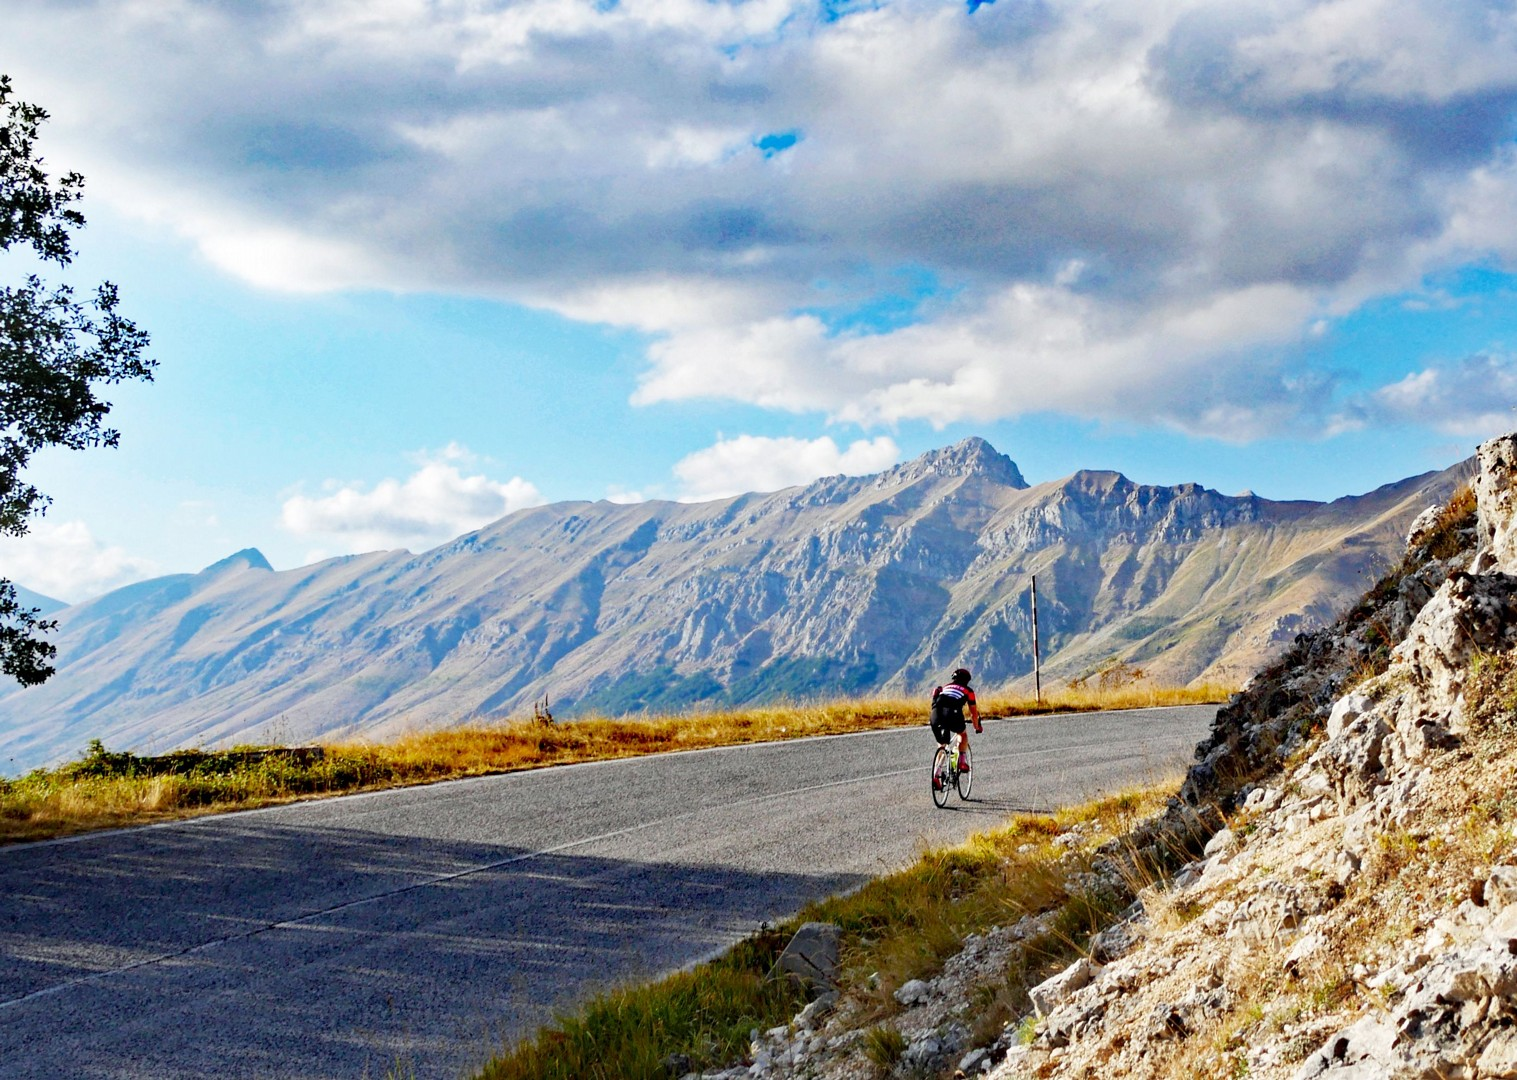 road-cycling-holiday-italy-abruzzo.jpg - Italy - Abruzzo - Appennini d'Abruzzo - Guided Road Cycling Holiday - Road Cycling